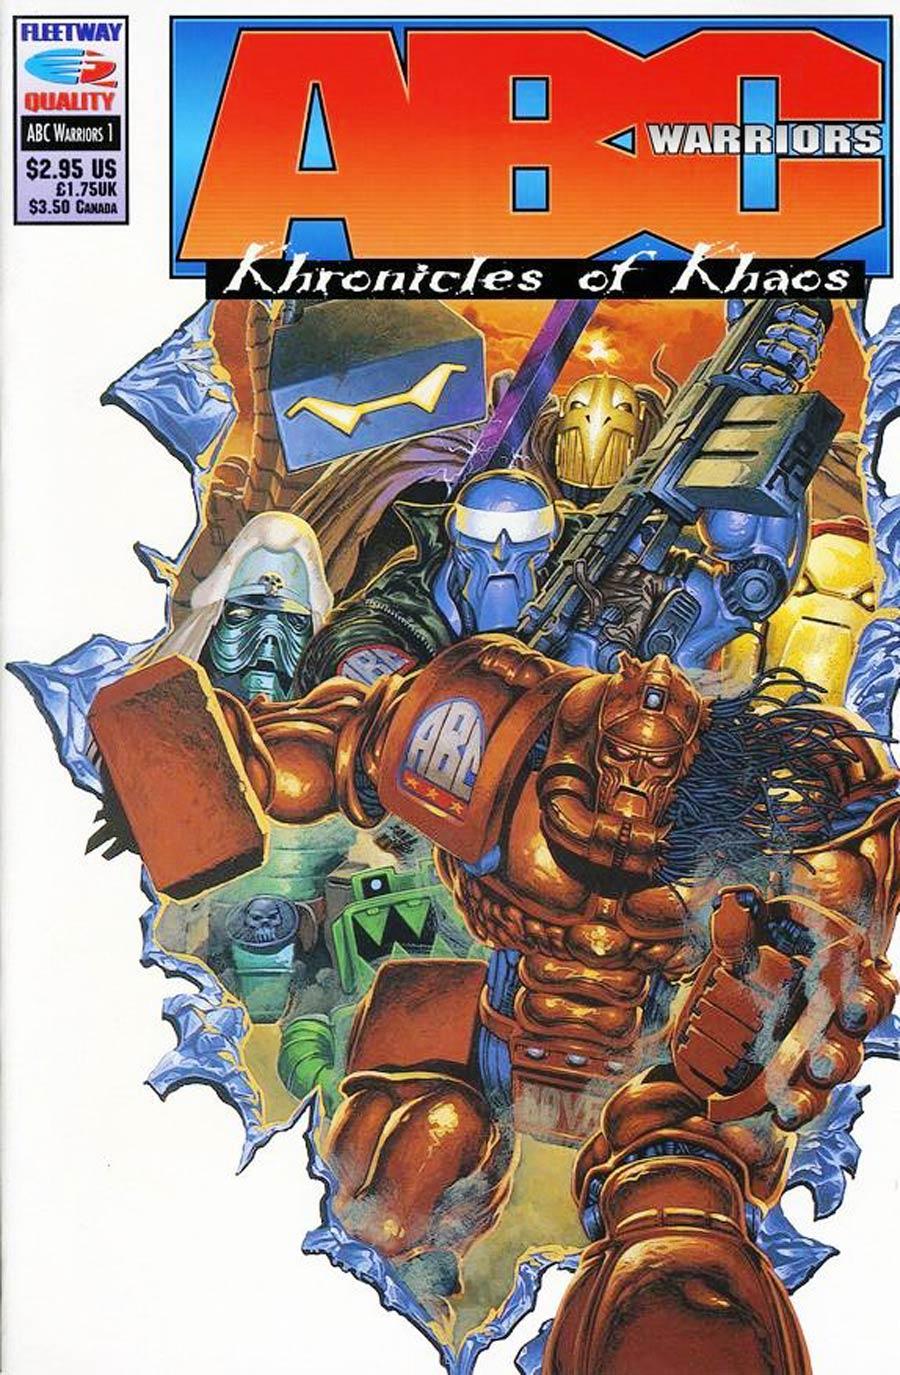 ABC Warriors Khronicles of Khaos #1